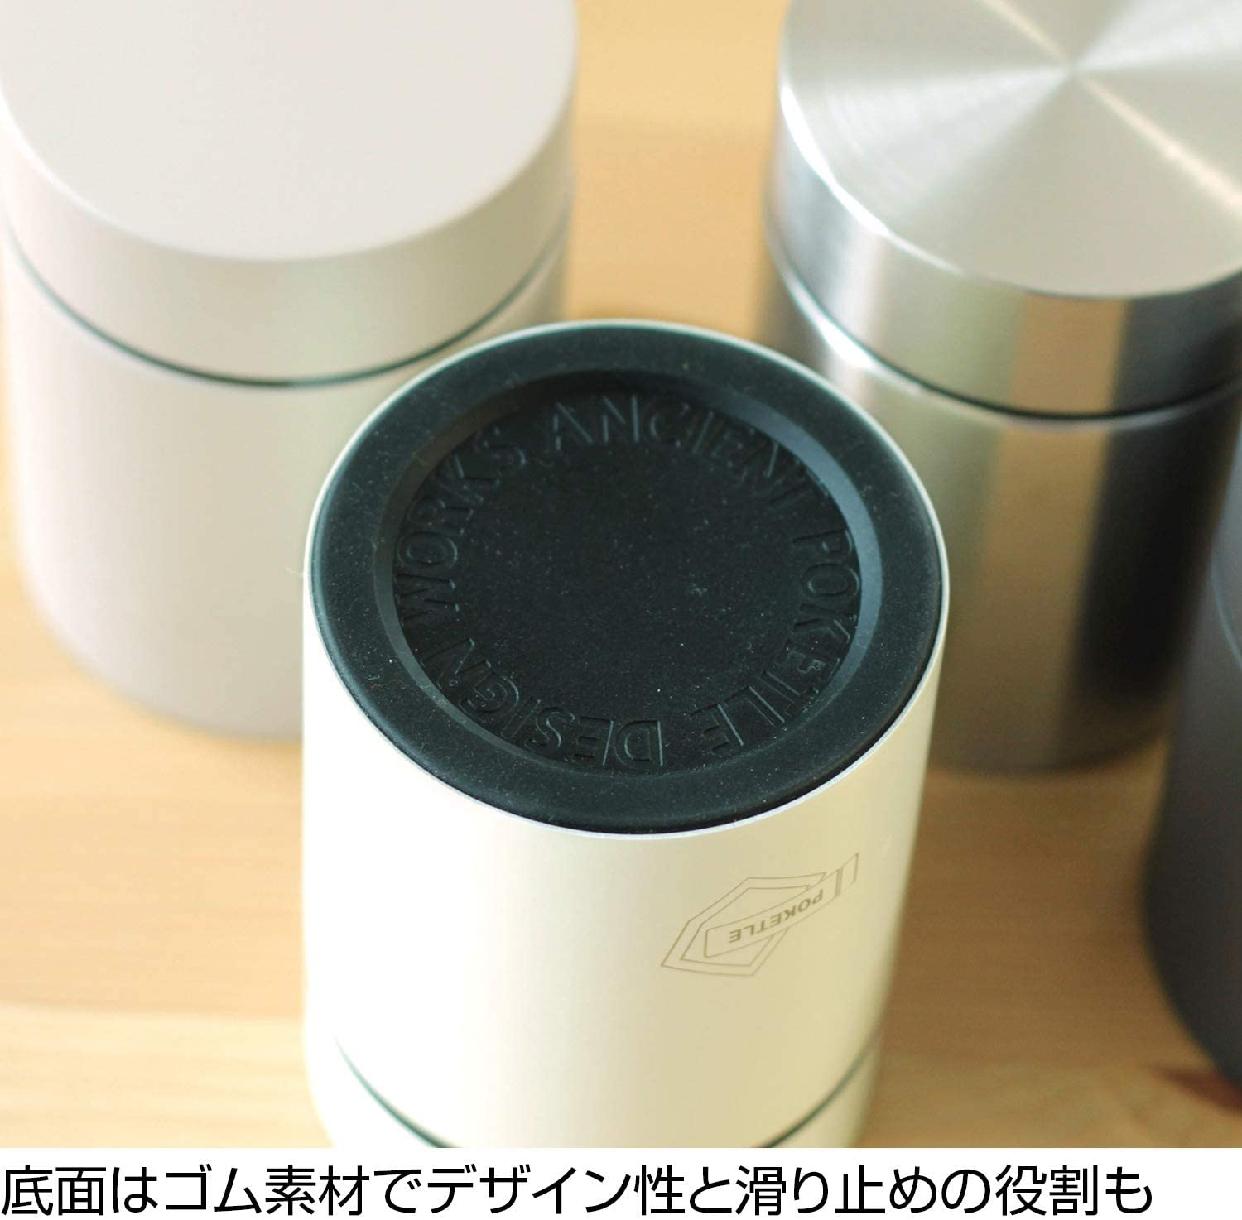 POKETLE(ポケトル)スープボトルの商品画像5